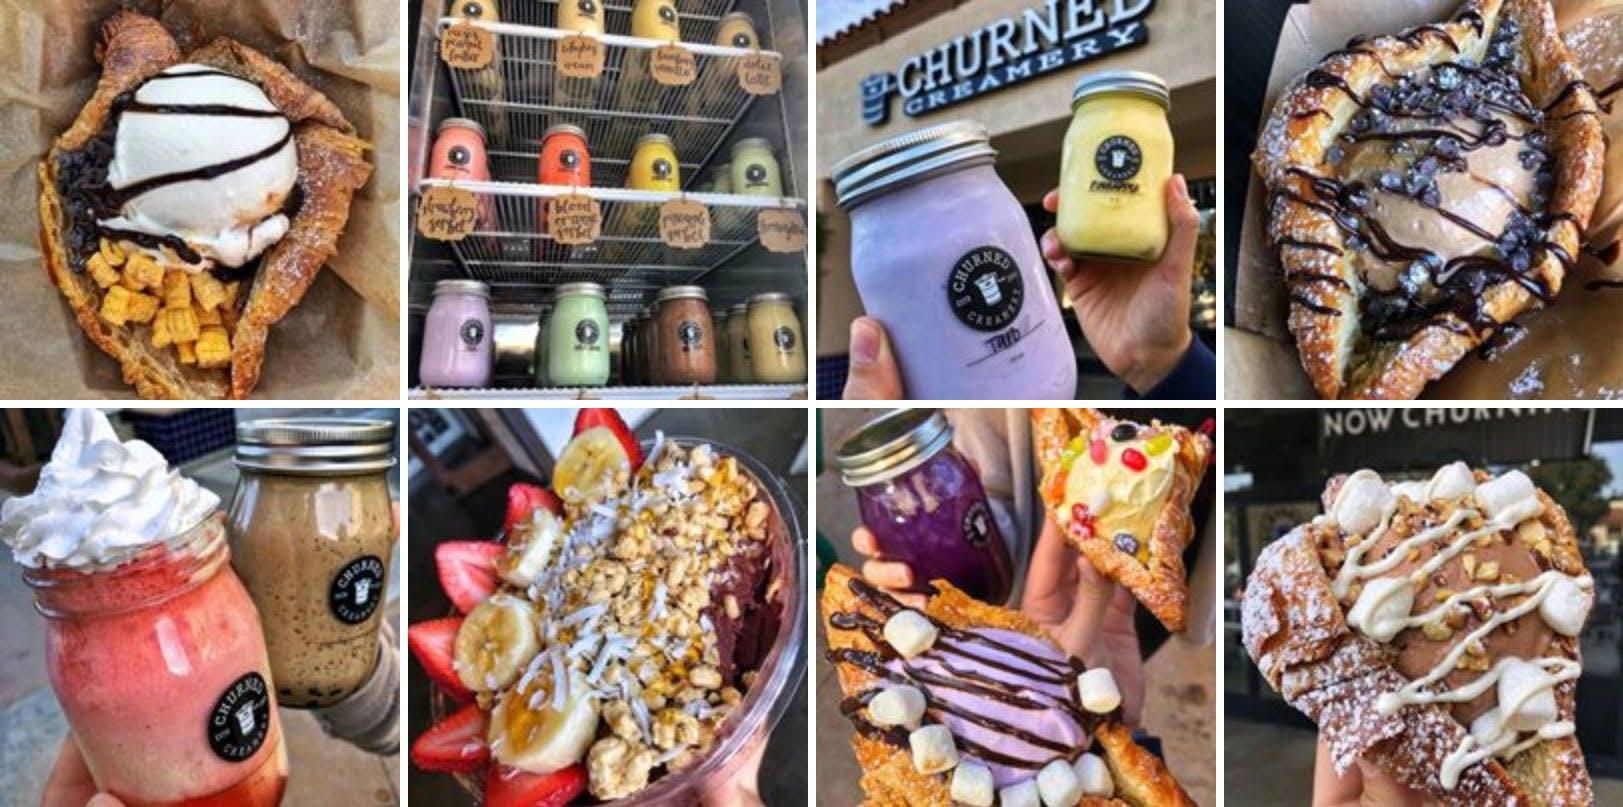 Churned-Creamery-Sugar-Land-texas